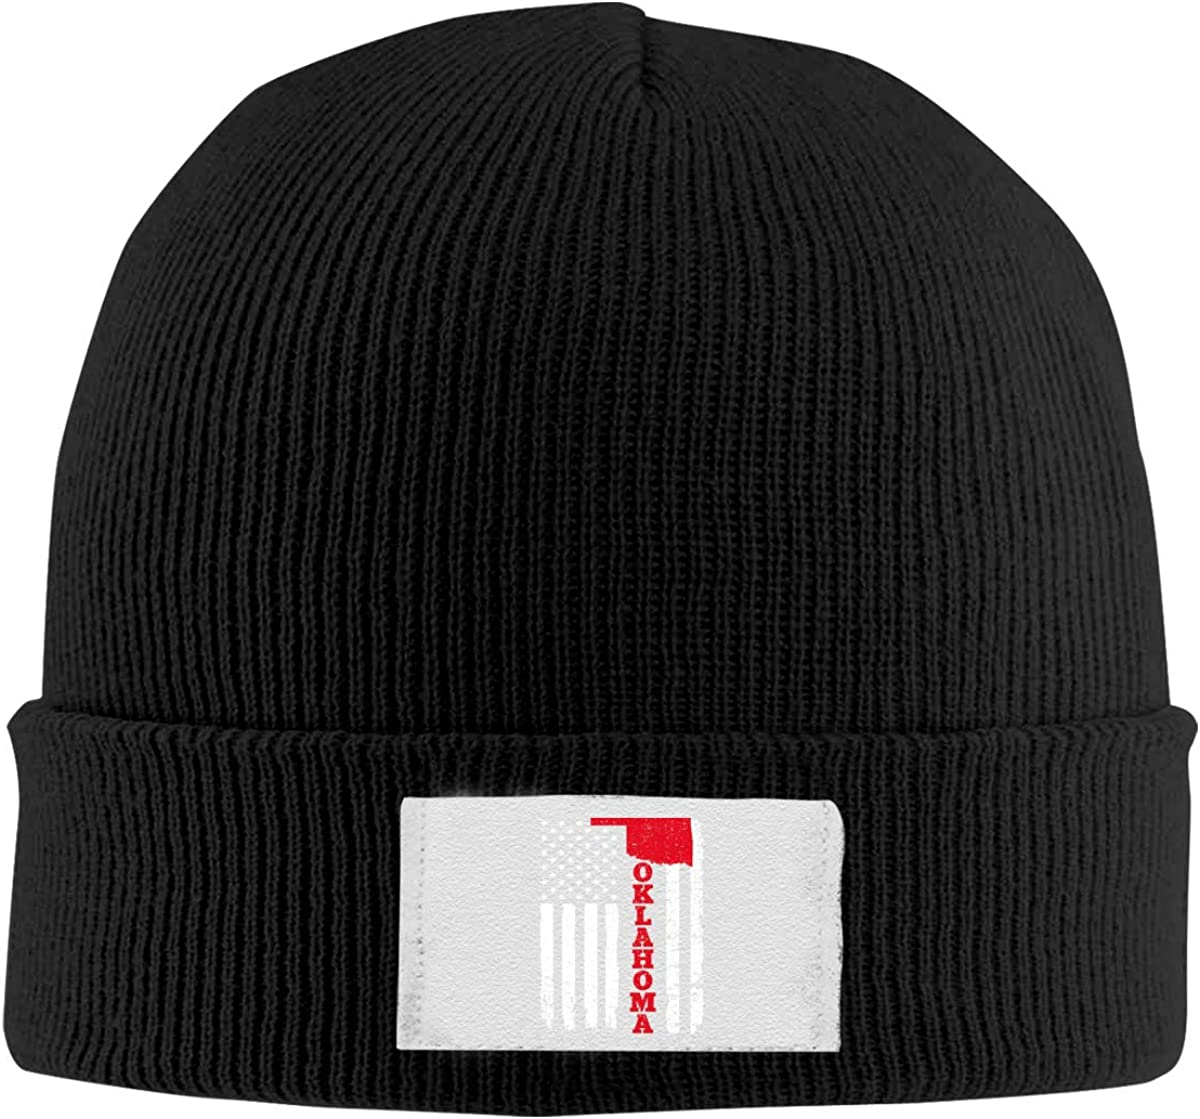 Classic Men Knit Beanie Hat USA Oklahoma Flag Skull Cap